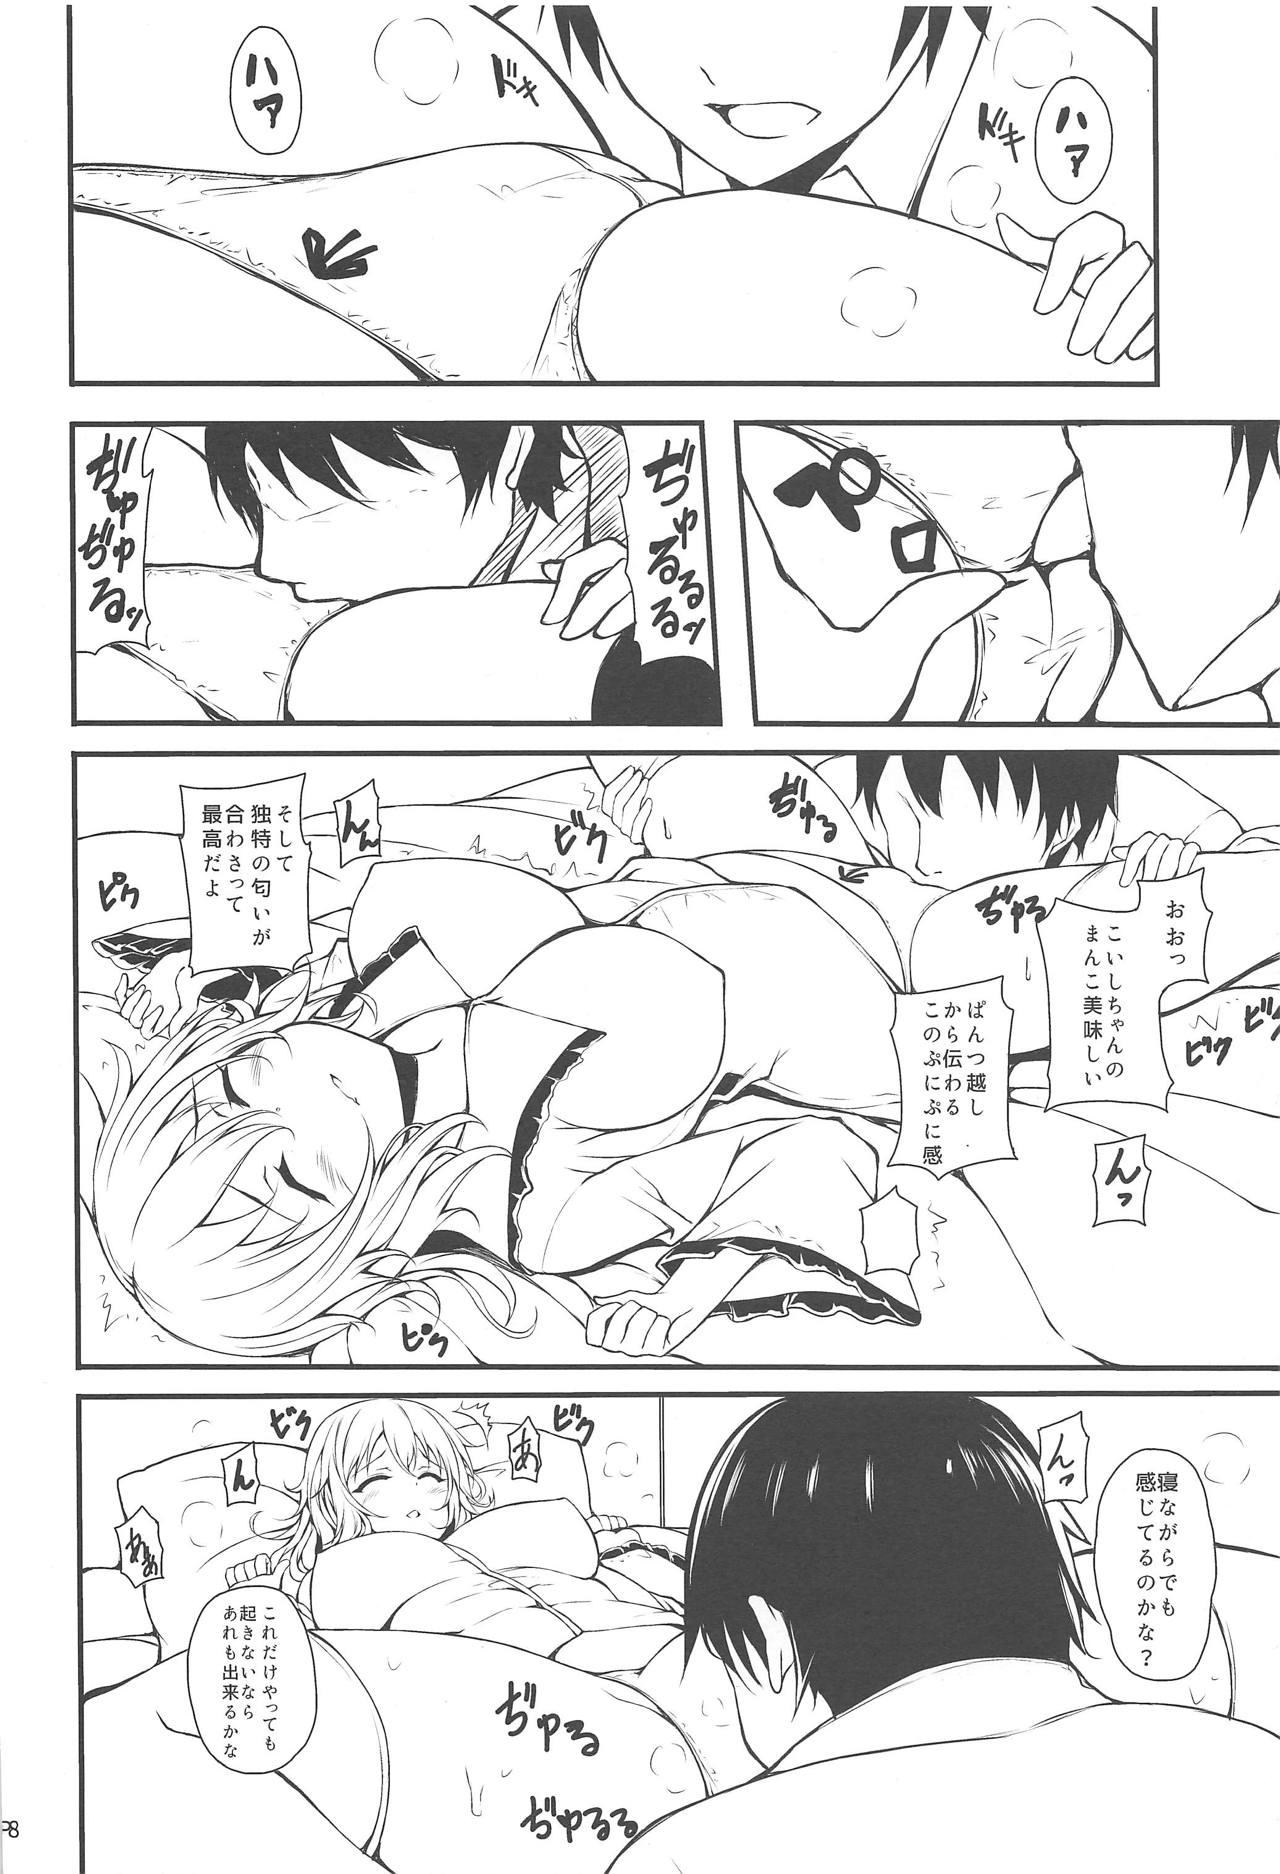 Koishi-chan ga Muboubi Sugite Gaman Dekinakatta 5